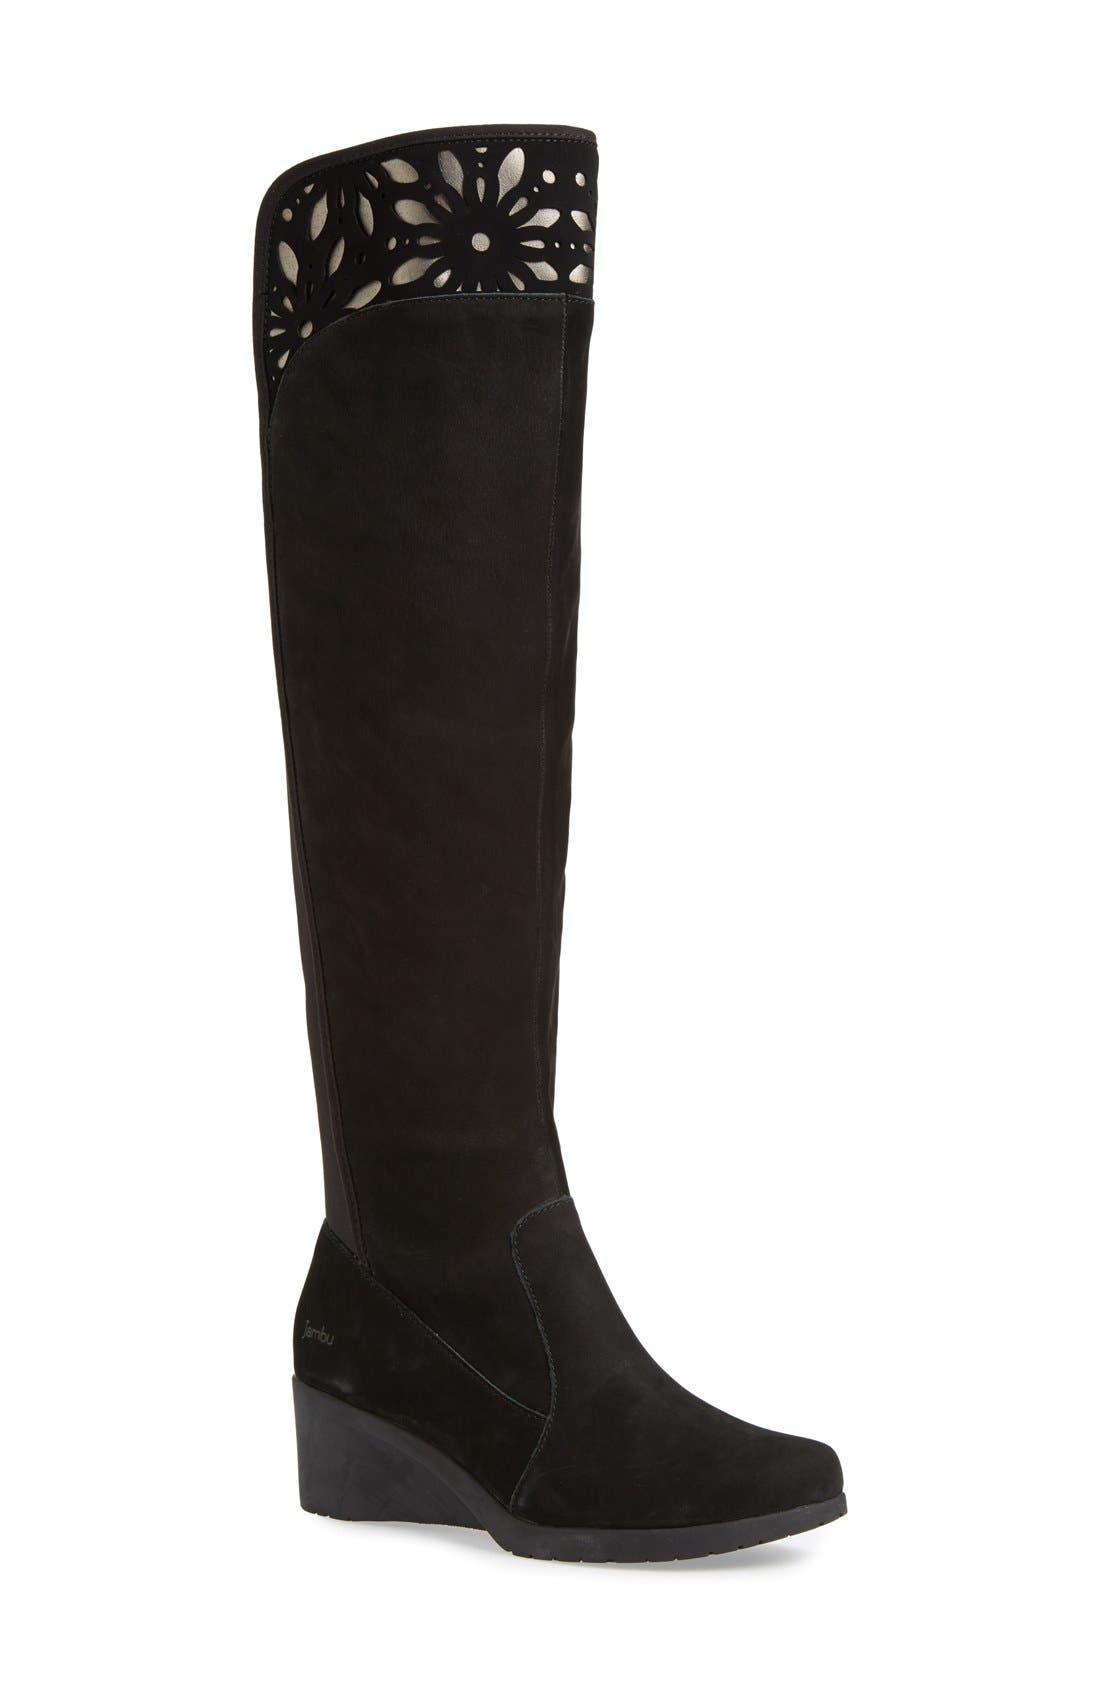 Alternate Image 1 Selected - Jambu'Natalia' CutoutDetail Water ResistantOver the Knee Boot (Women)